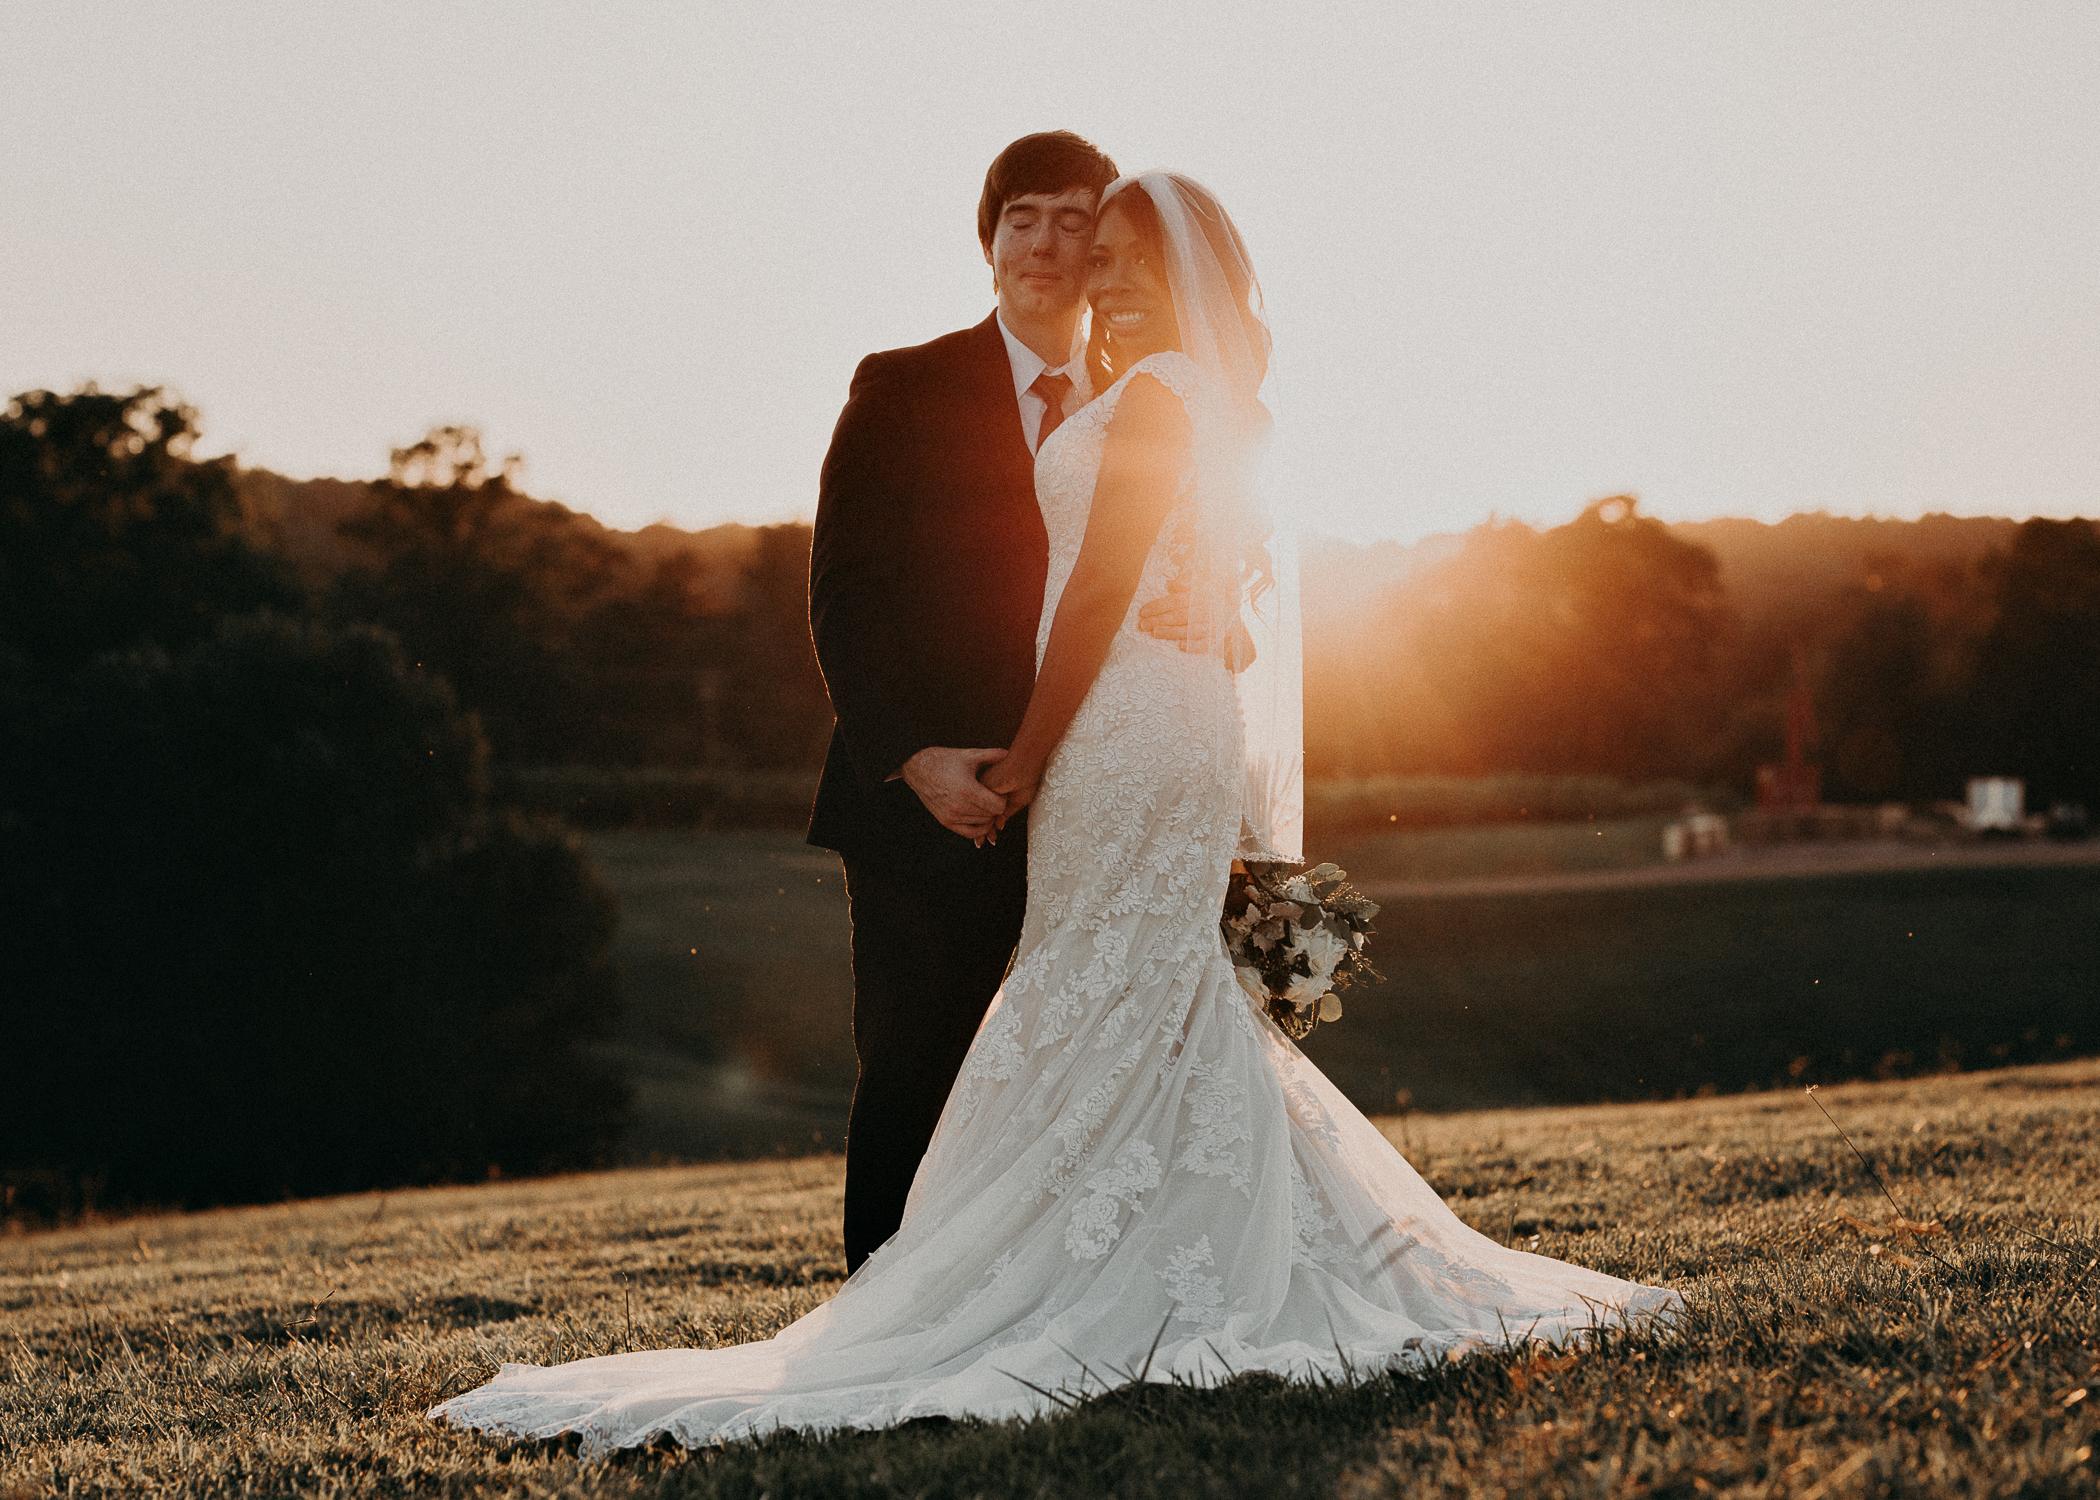 78- Kaya_vineyard_dahlonega_wedding_venue_bride_and_groom_sunset_pictures_aline_marin_photography.jpg